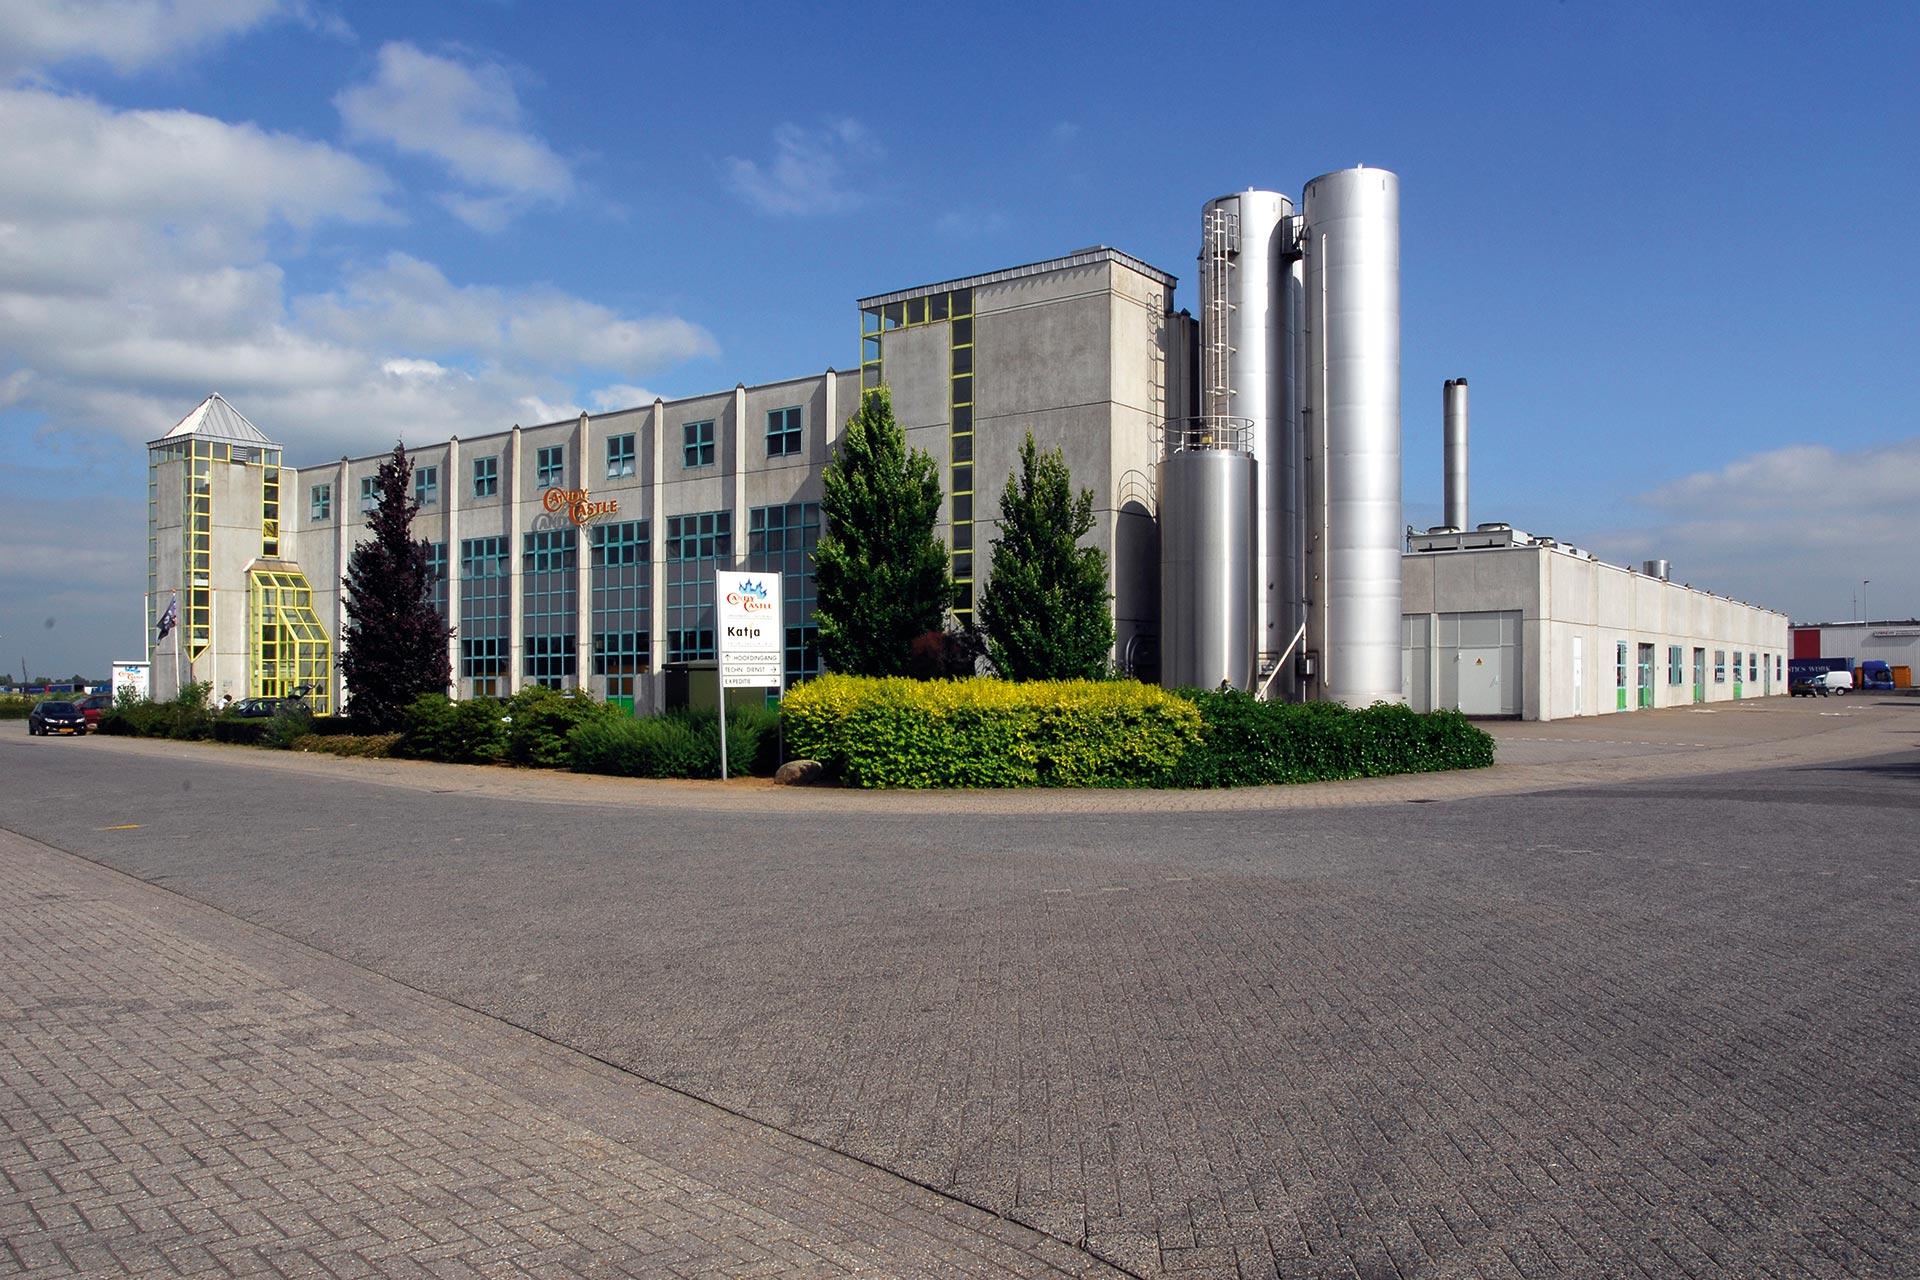 1993 Nieuwe hypermoderne fabriek